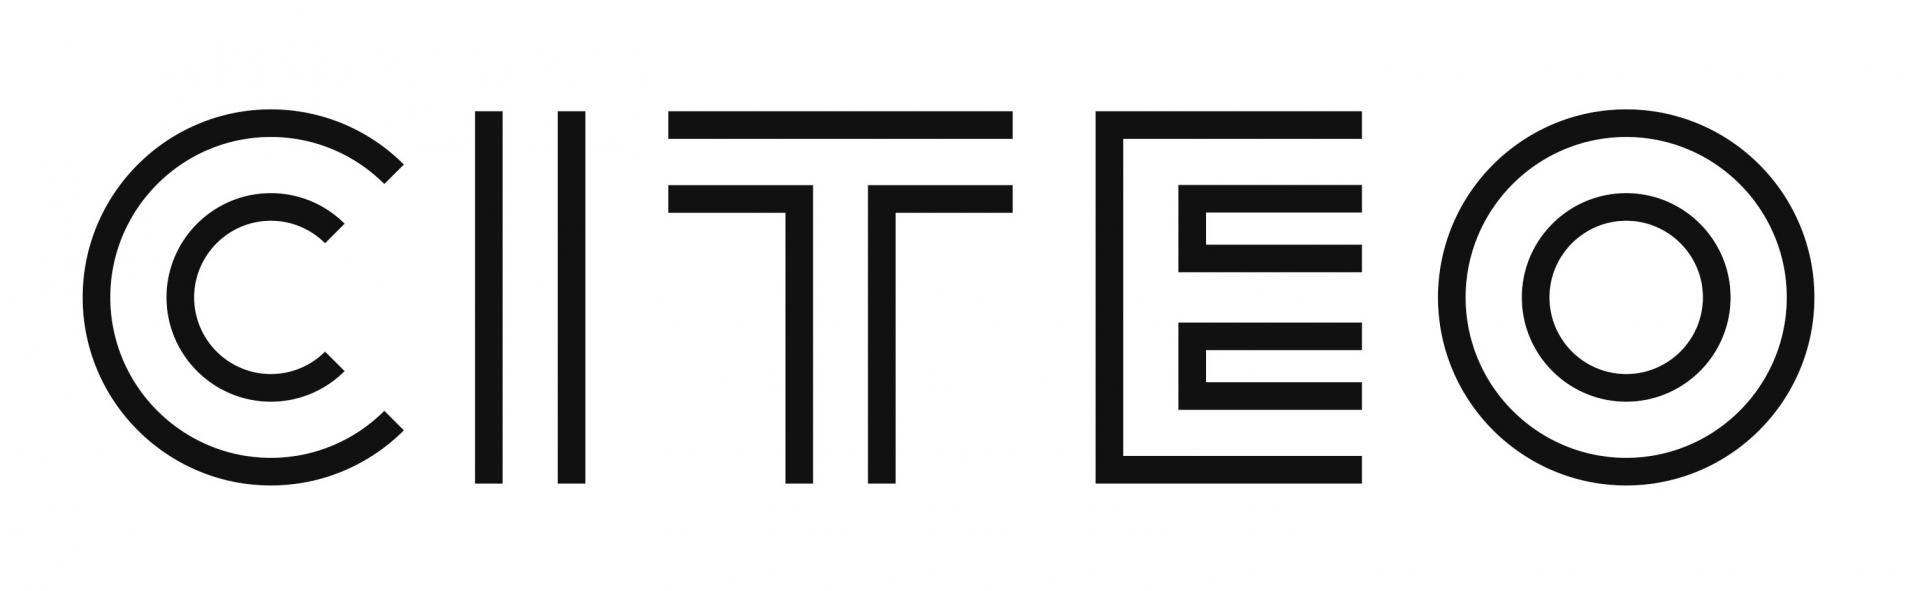 Logo citeo 1